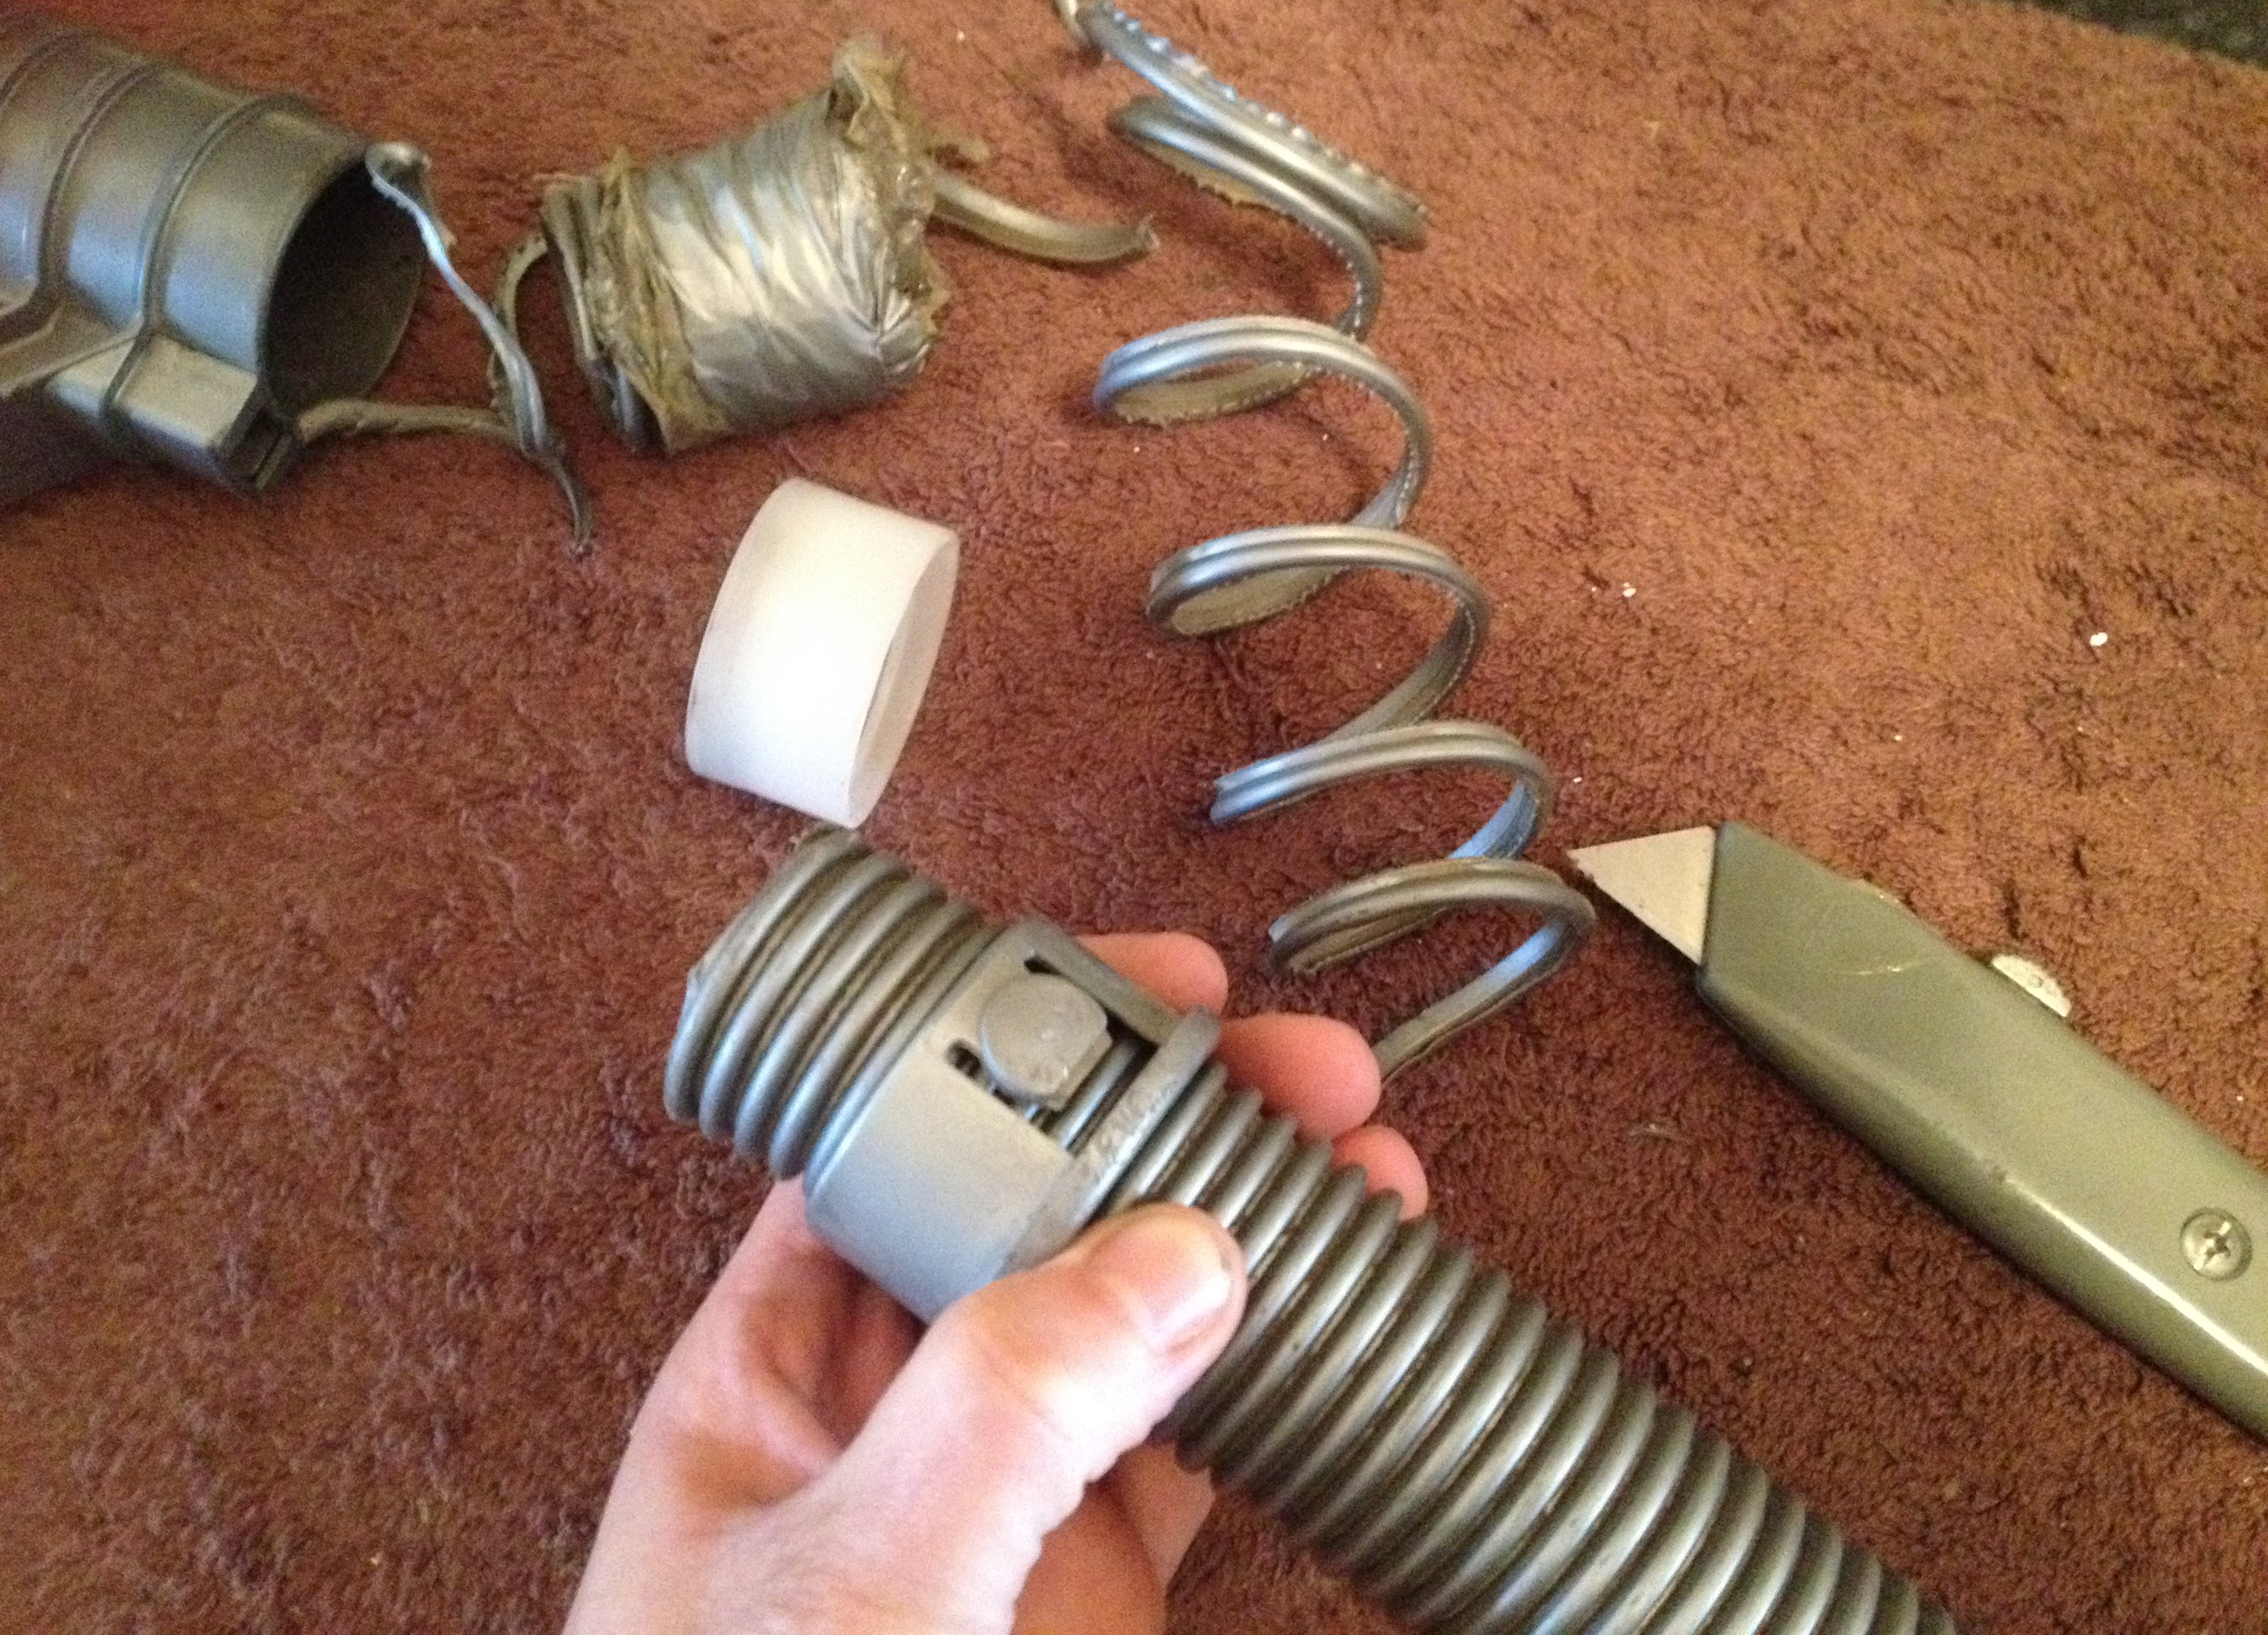 Repairing my split vacuum cleaner hose.